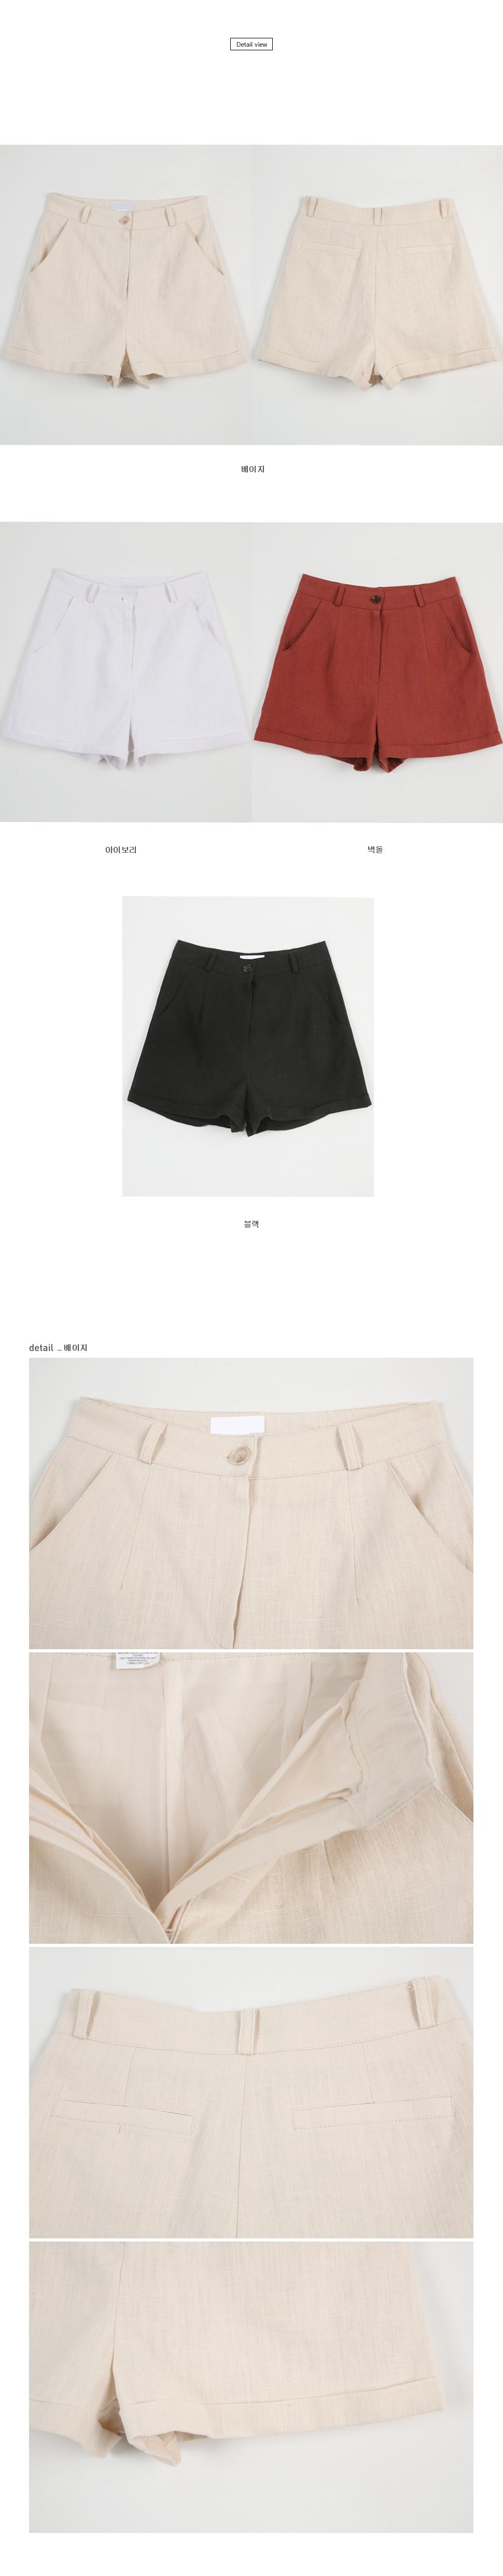 Doppel Roll-up Shorts - Ivory, Black M size ships same day